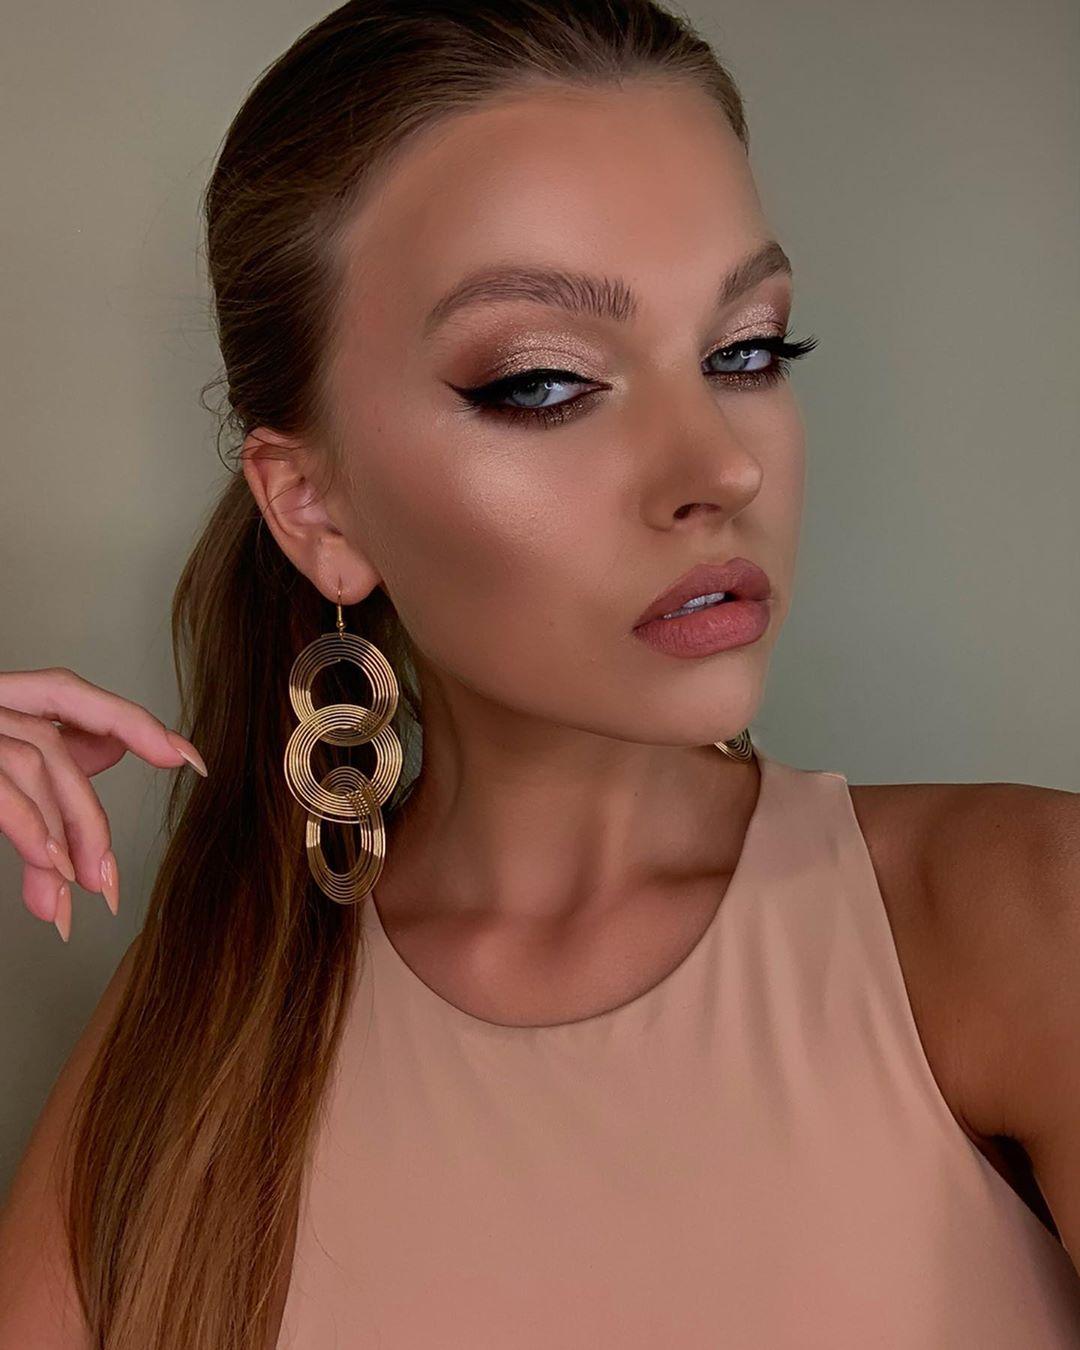 Veronika-Kysheleva-Wallpapers-Insta-Fit-Bio-9